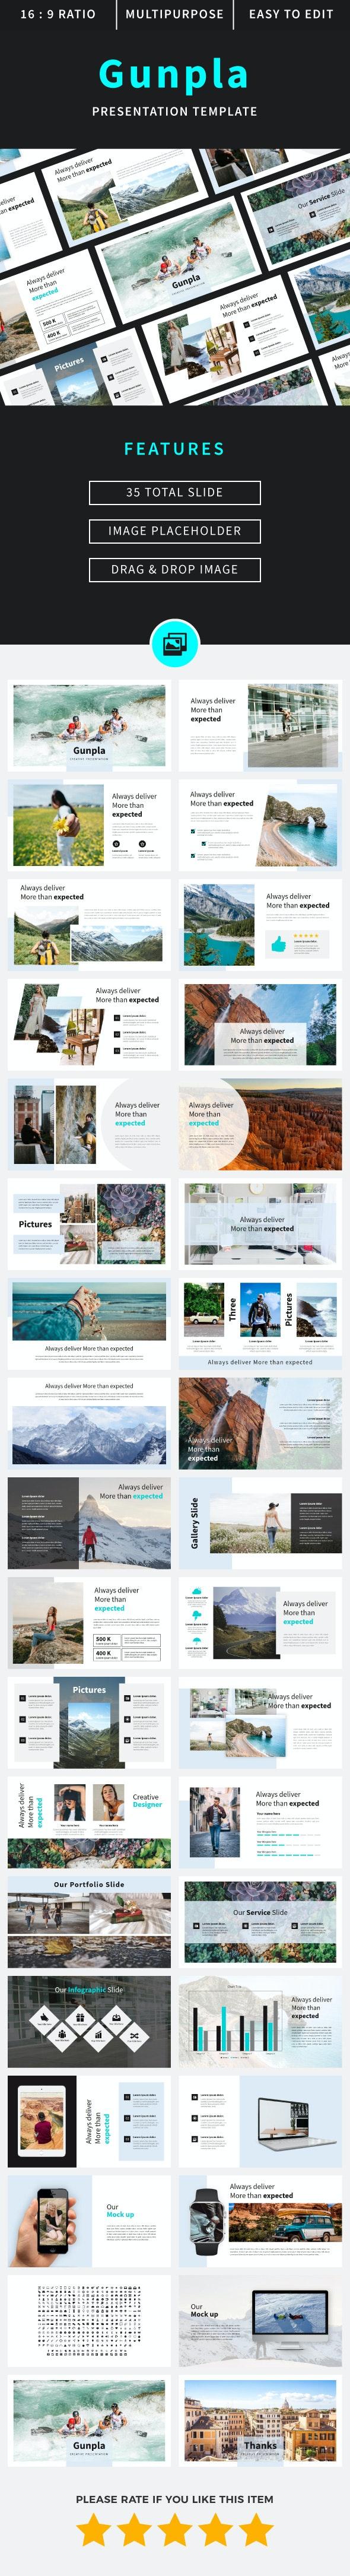 Gunpla - Google Slide - Google Slides Presentation Templates